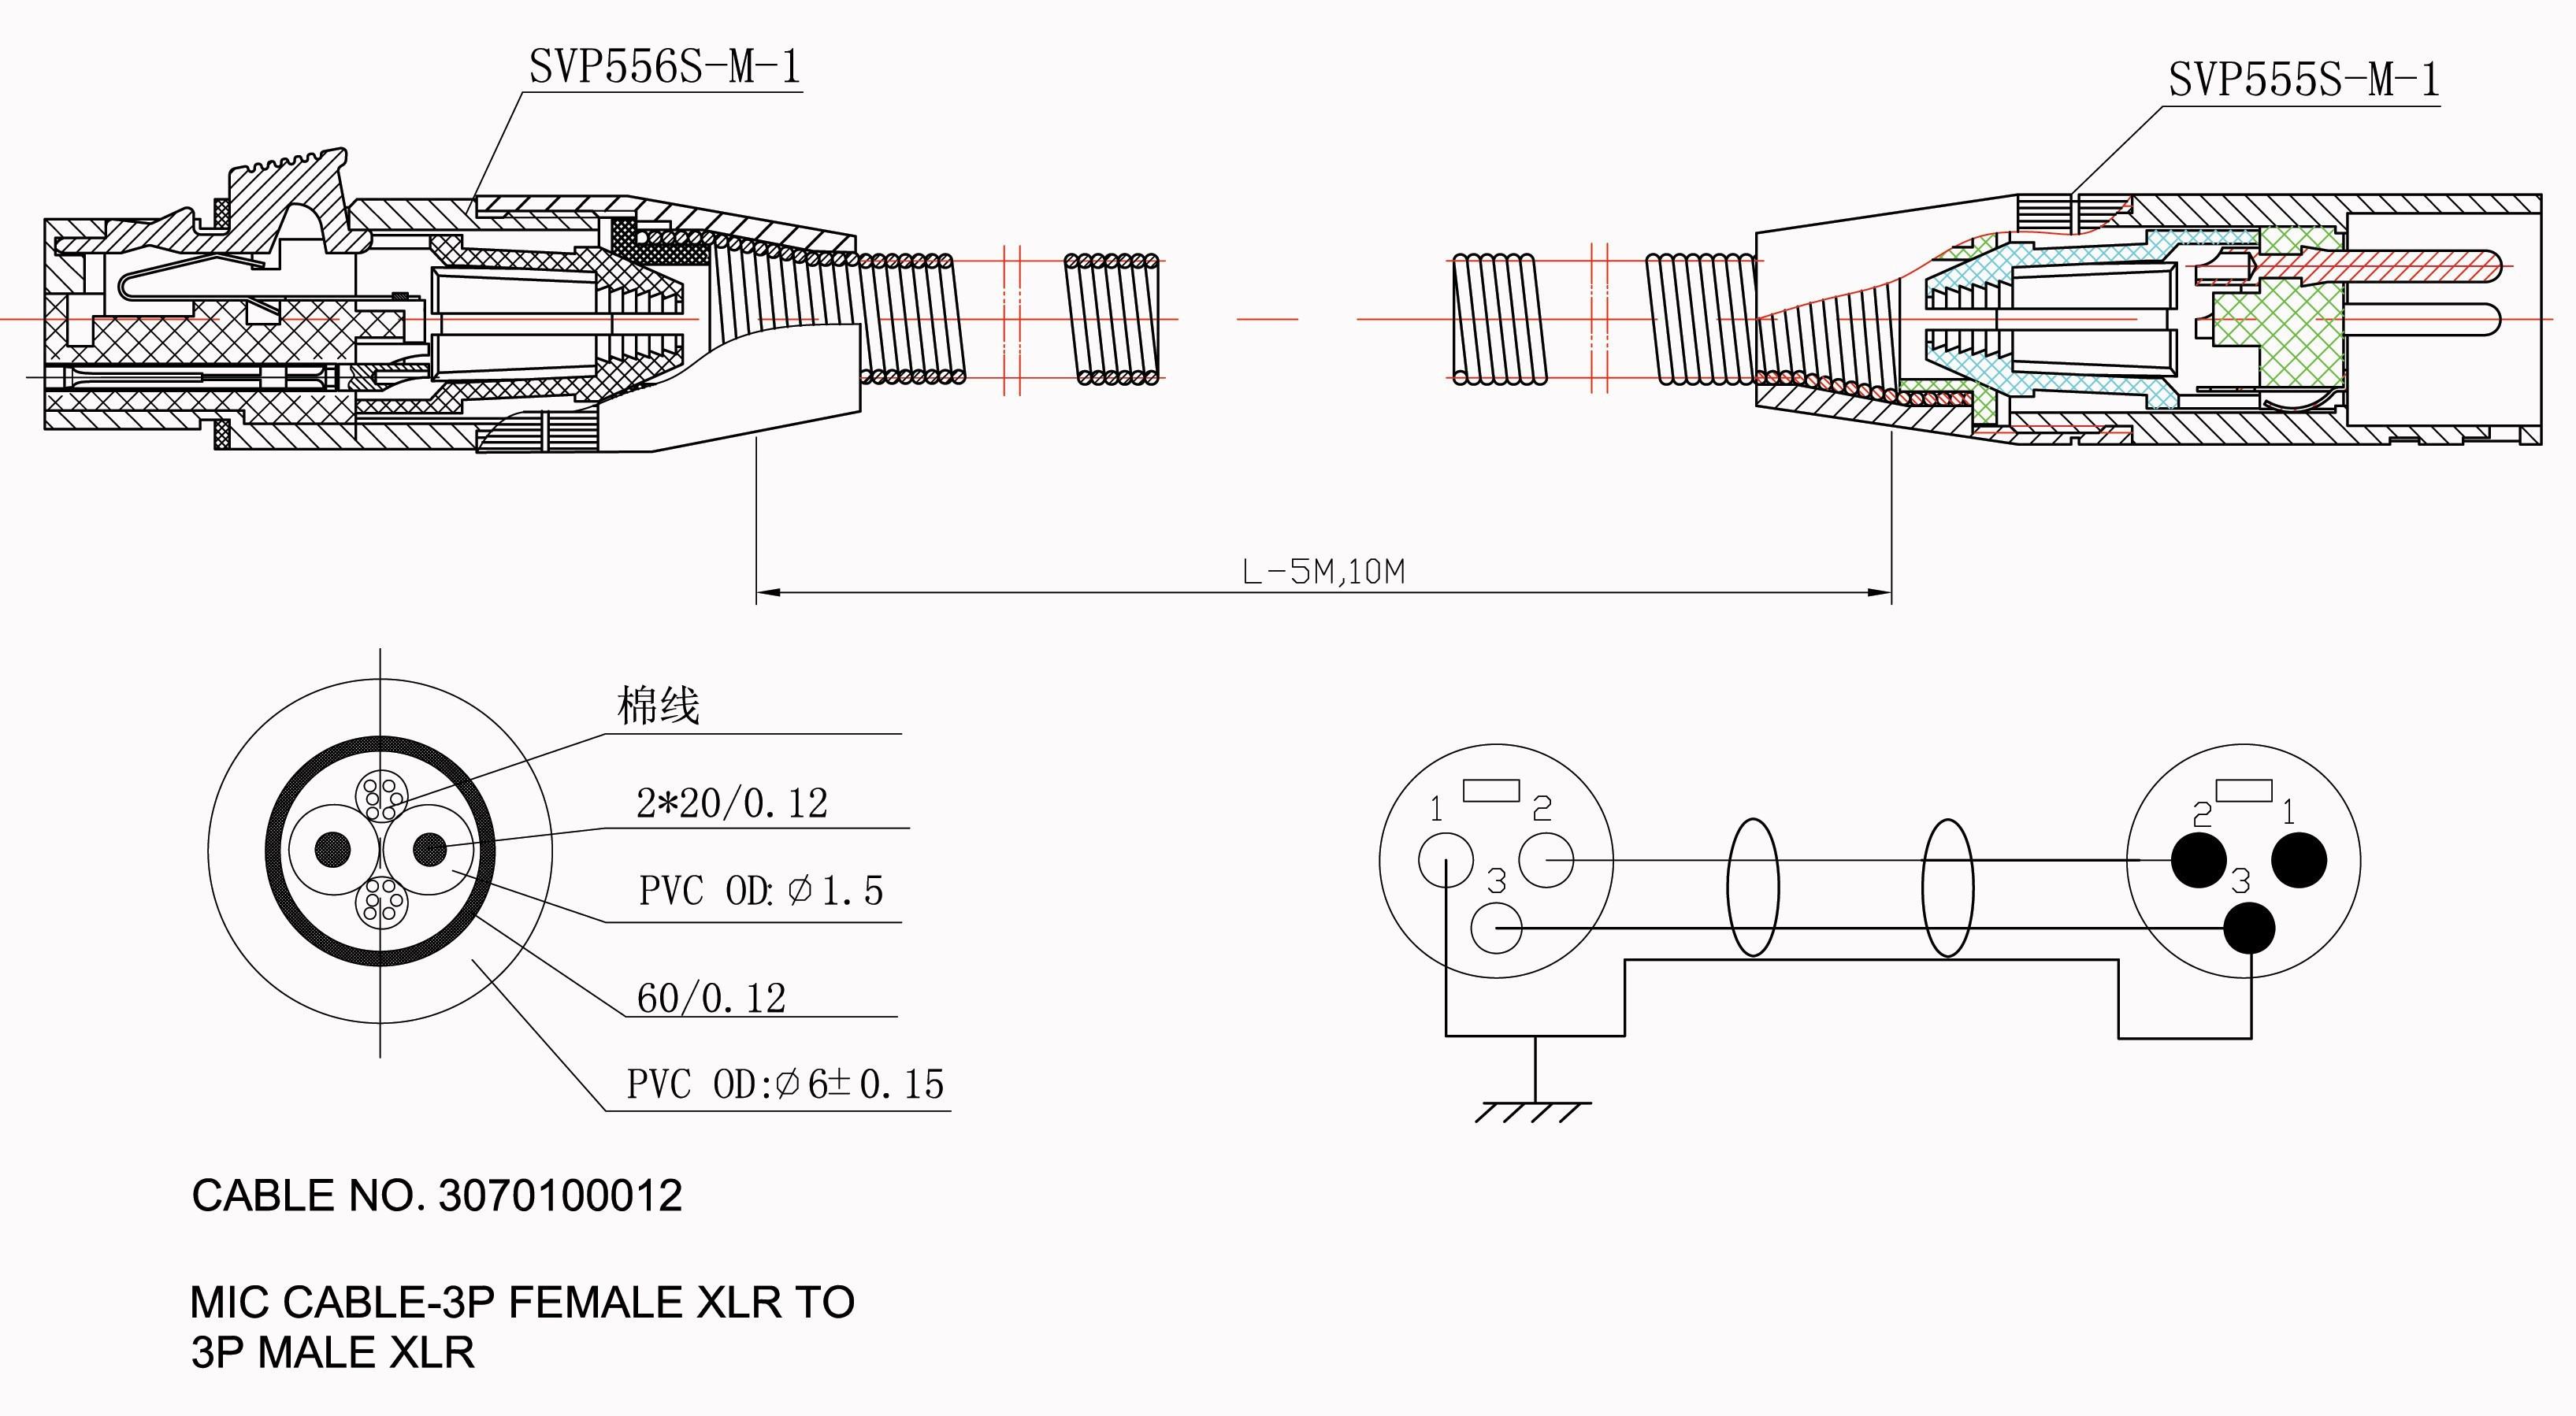 Dsl Pots Splitter Wiring Diagram List Adsl Rj11 Wiring Diagram For Search For Wiring Diagrams •